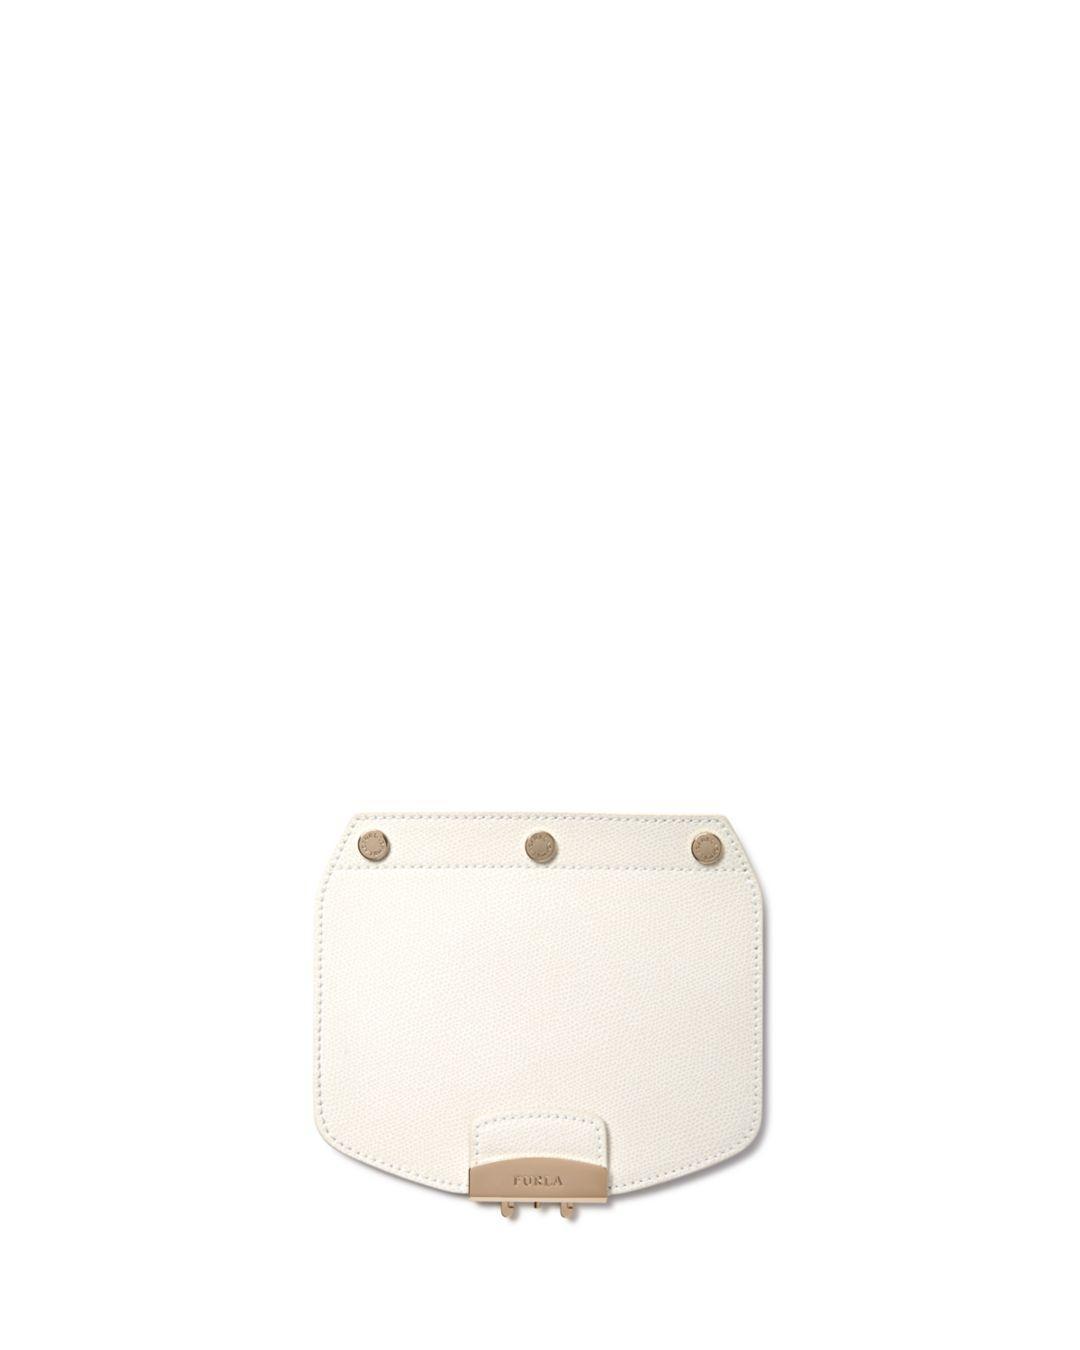 766eb6c9c7 Furla - White My Play Interchangeable Metropolis Mini Leather Flap - Lyst.  View fullscreen